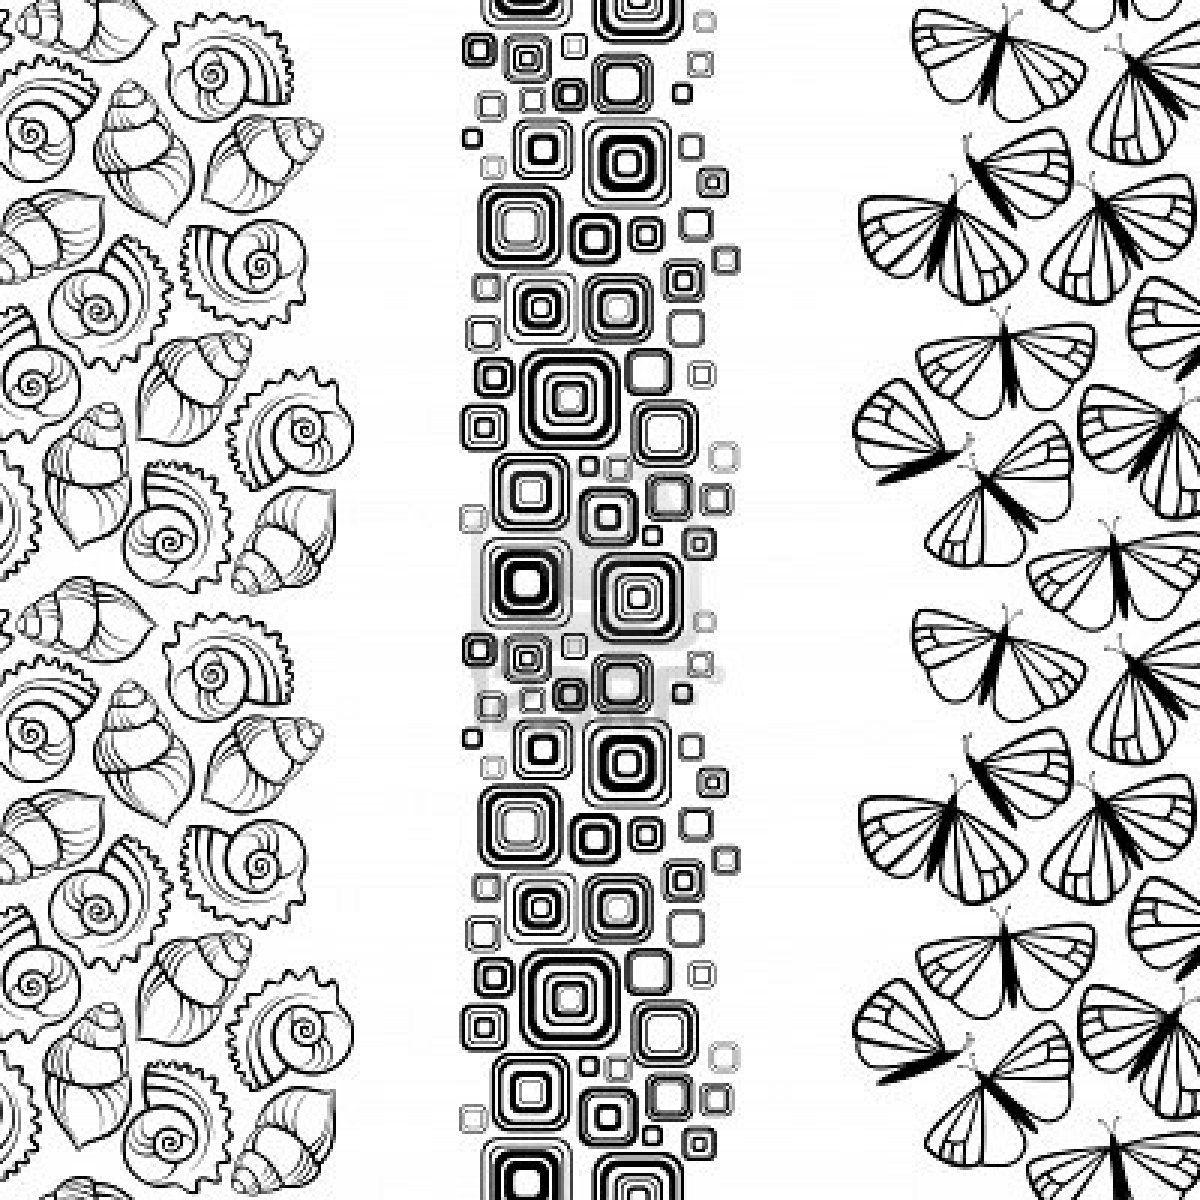 Disegni geometrici decorativi , Disegni da colorare , IMAGIXS